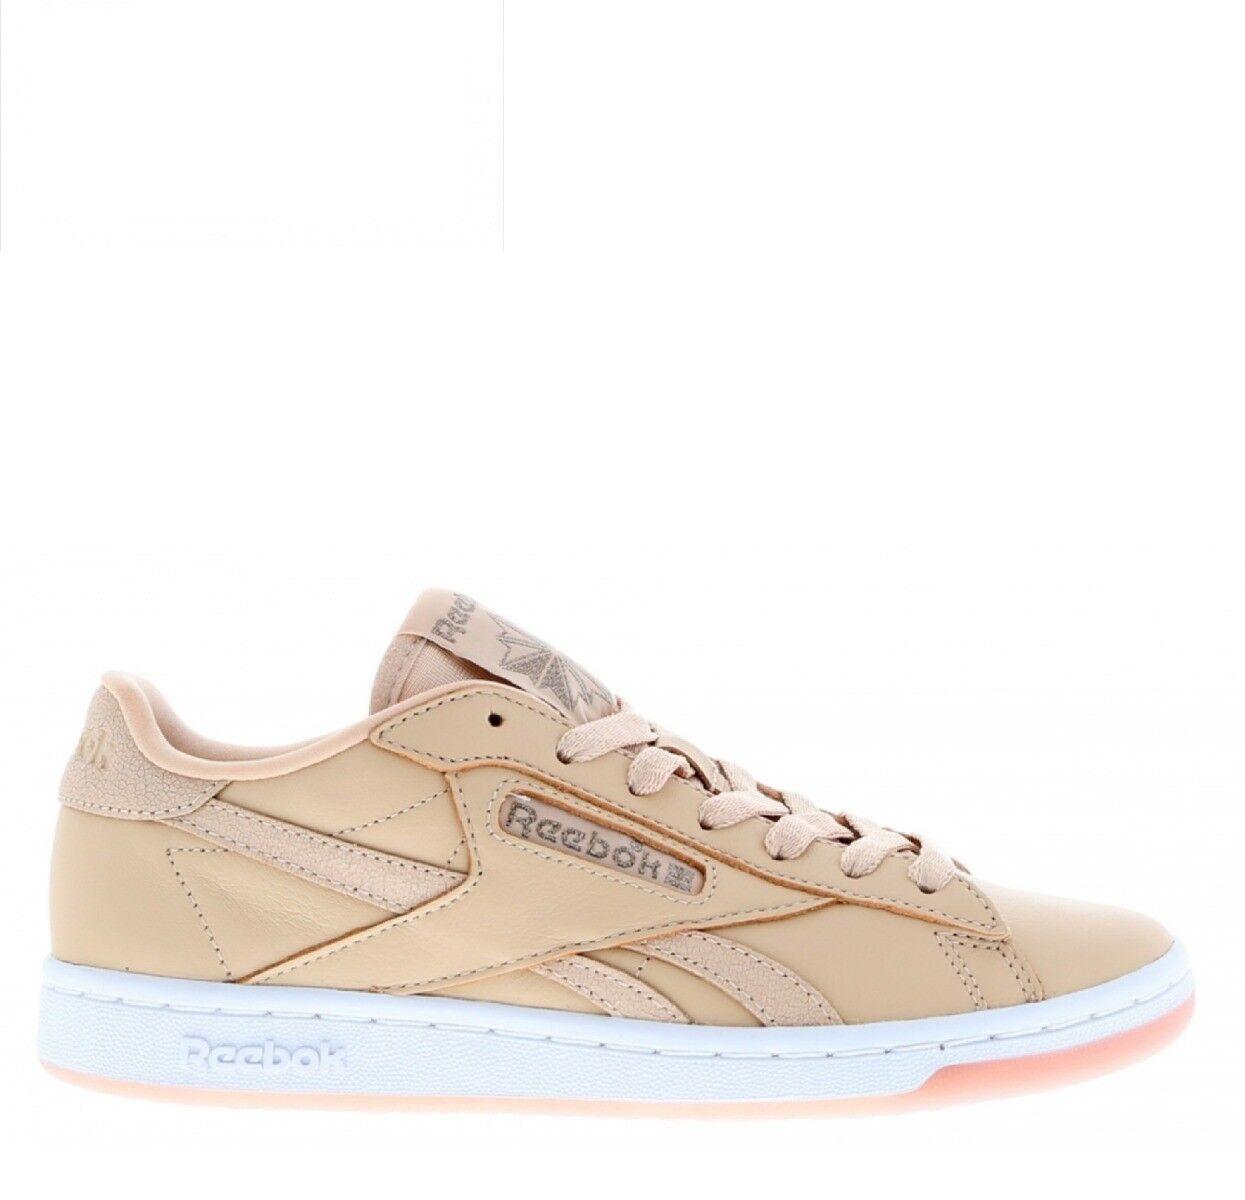 Reebok Classic NPC UK Metals Damenschuhe Trainer Schuhe Größe 6 Trainer Schuhe  /-